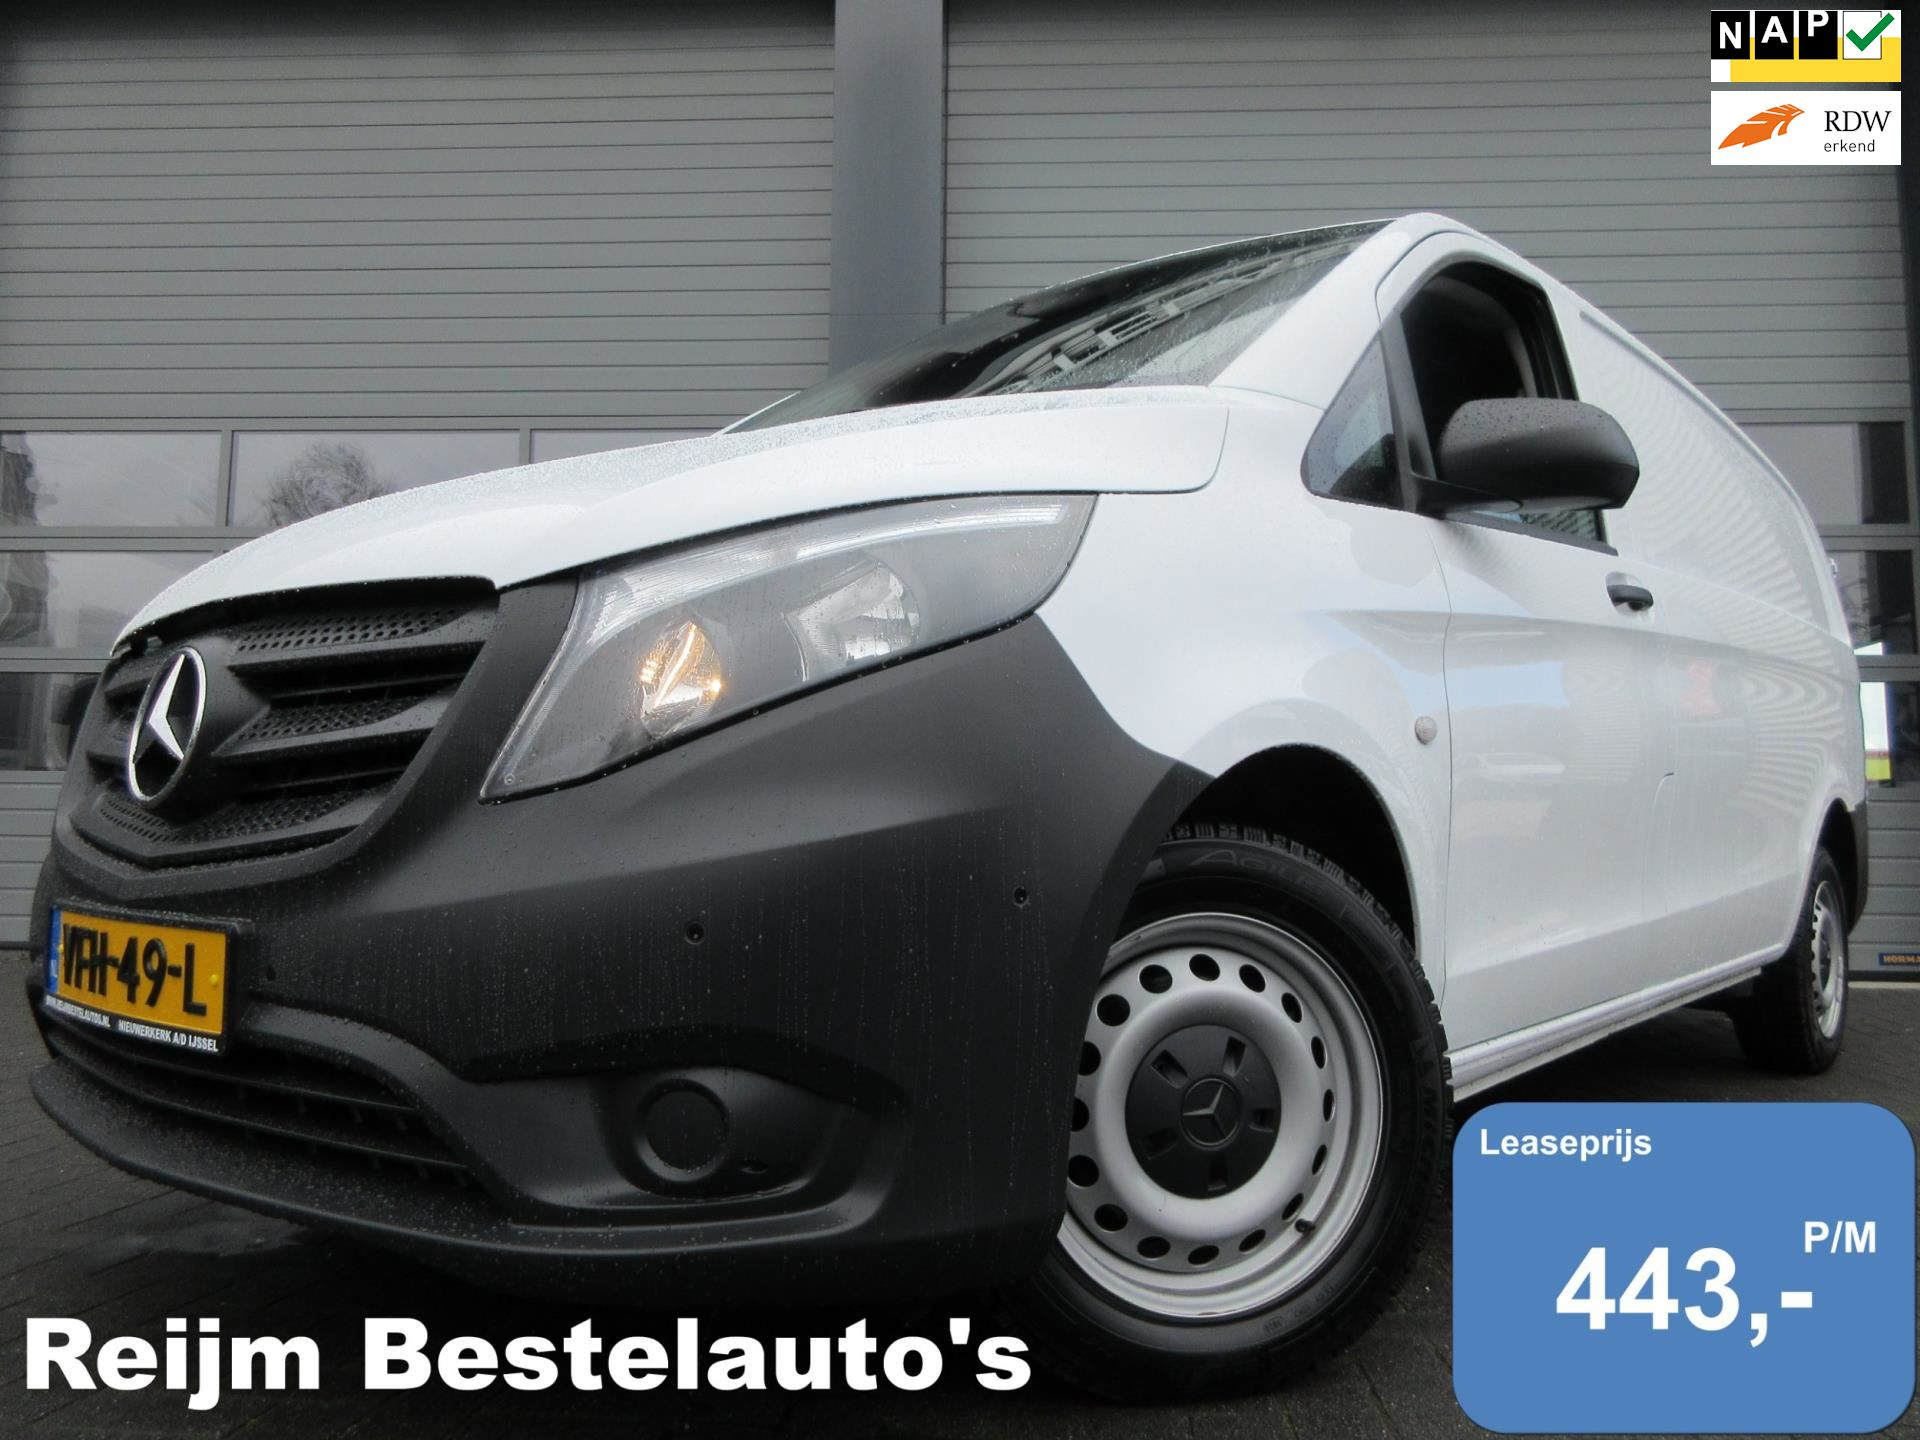 Mercedes-Benz Vito occasion - Reijm Bestelauto's